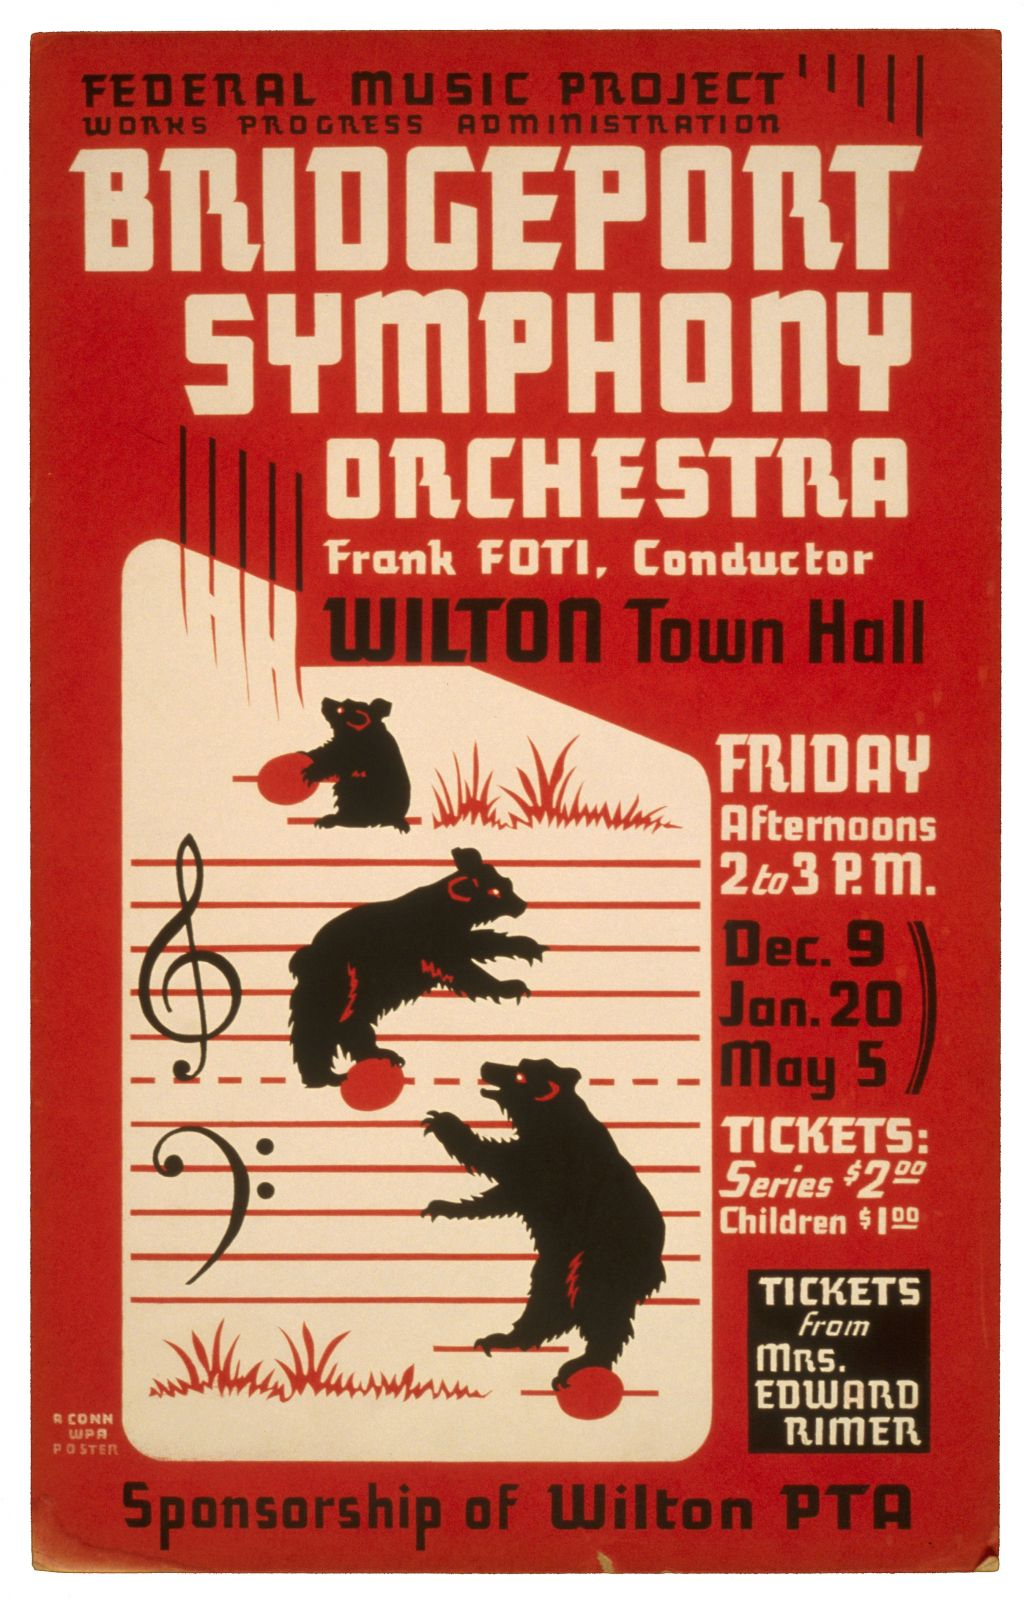 Bridgeport Symphony Orchestra - Frank Foti, conductor